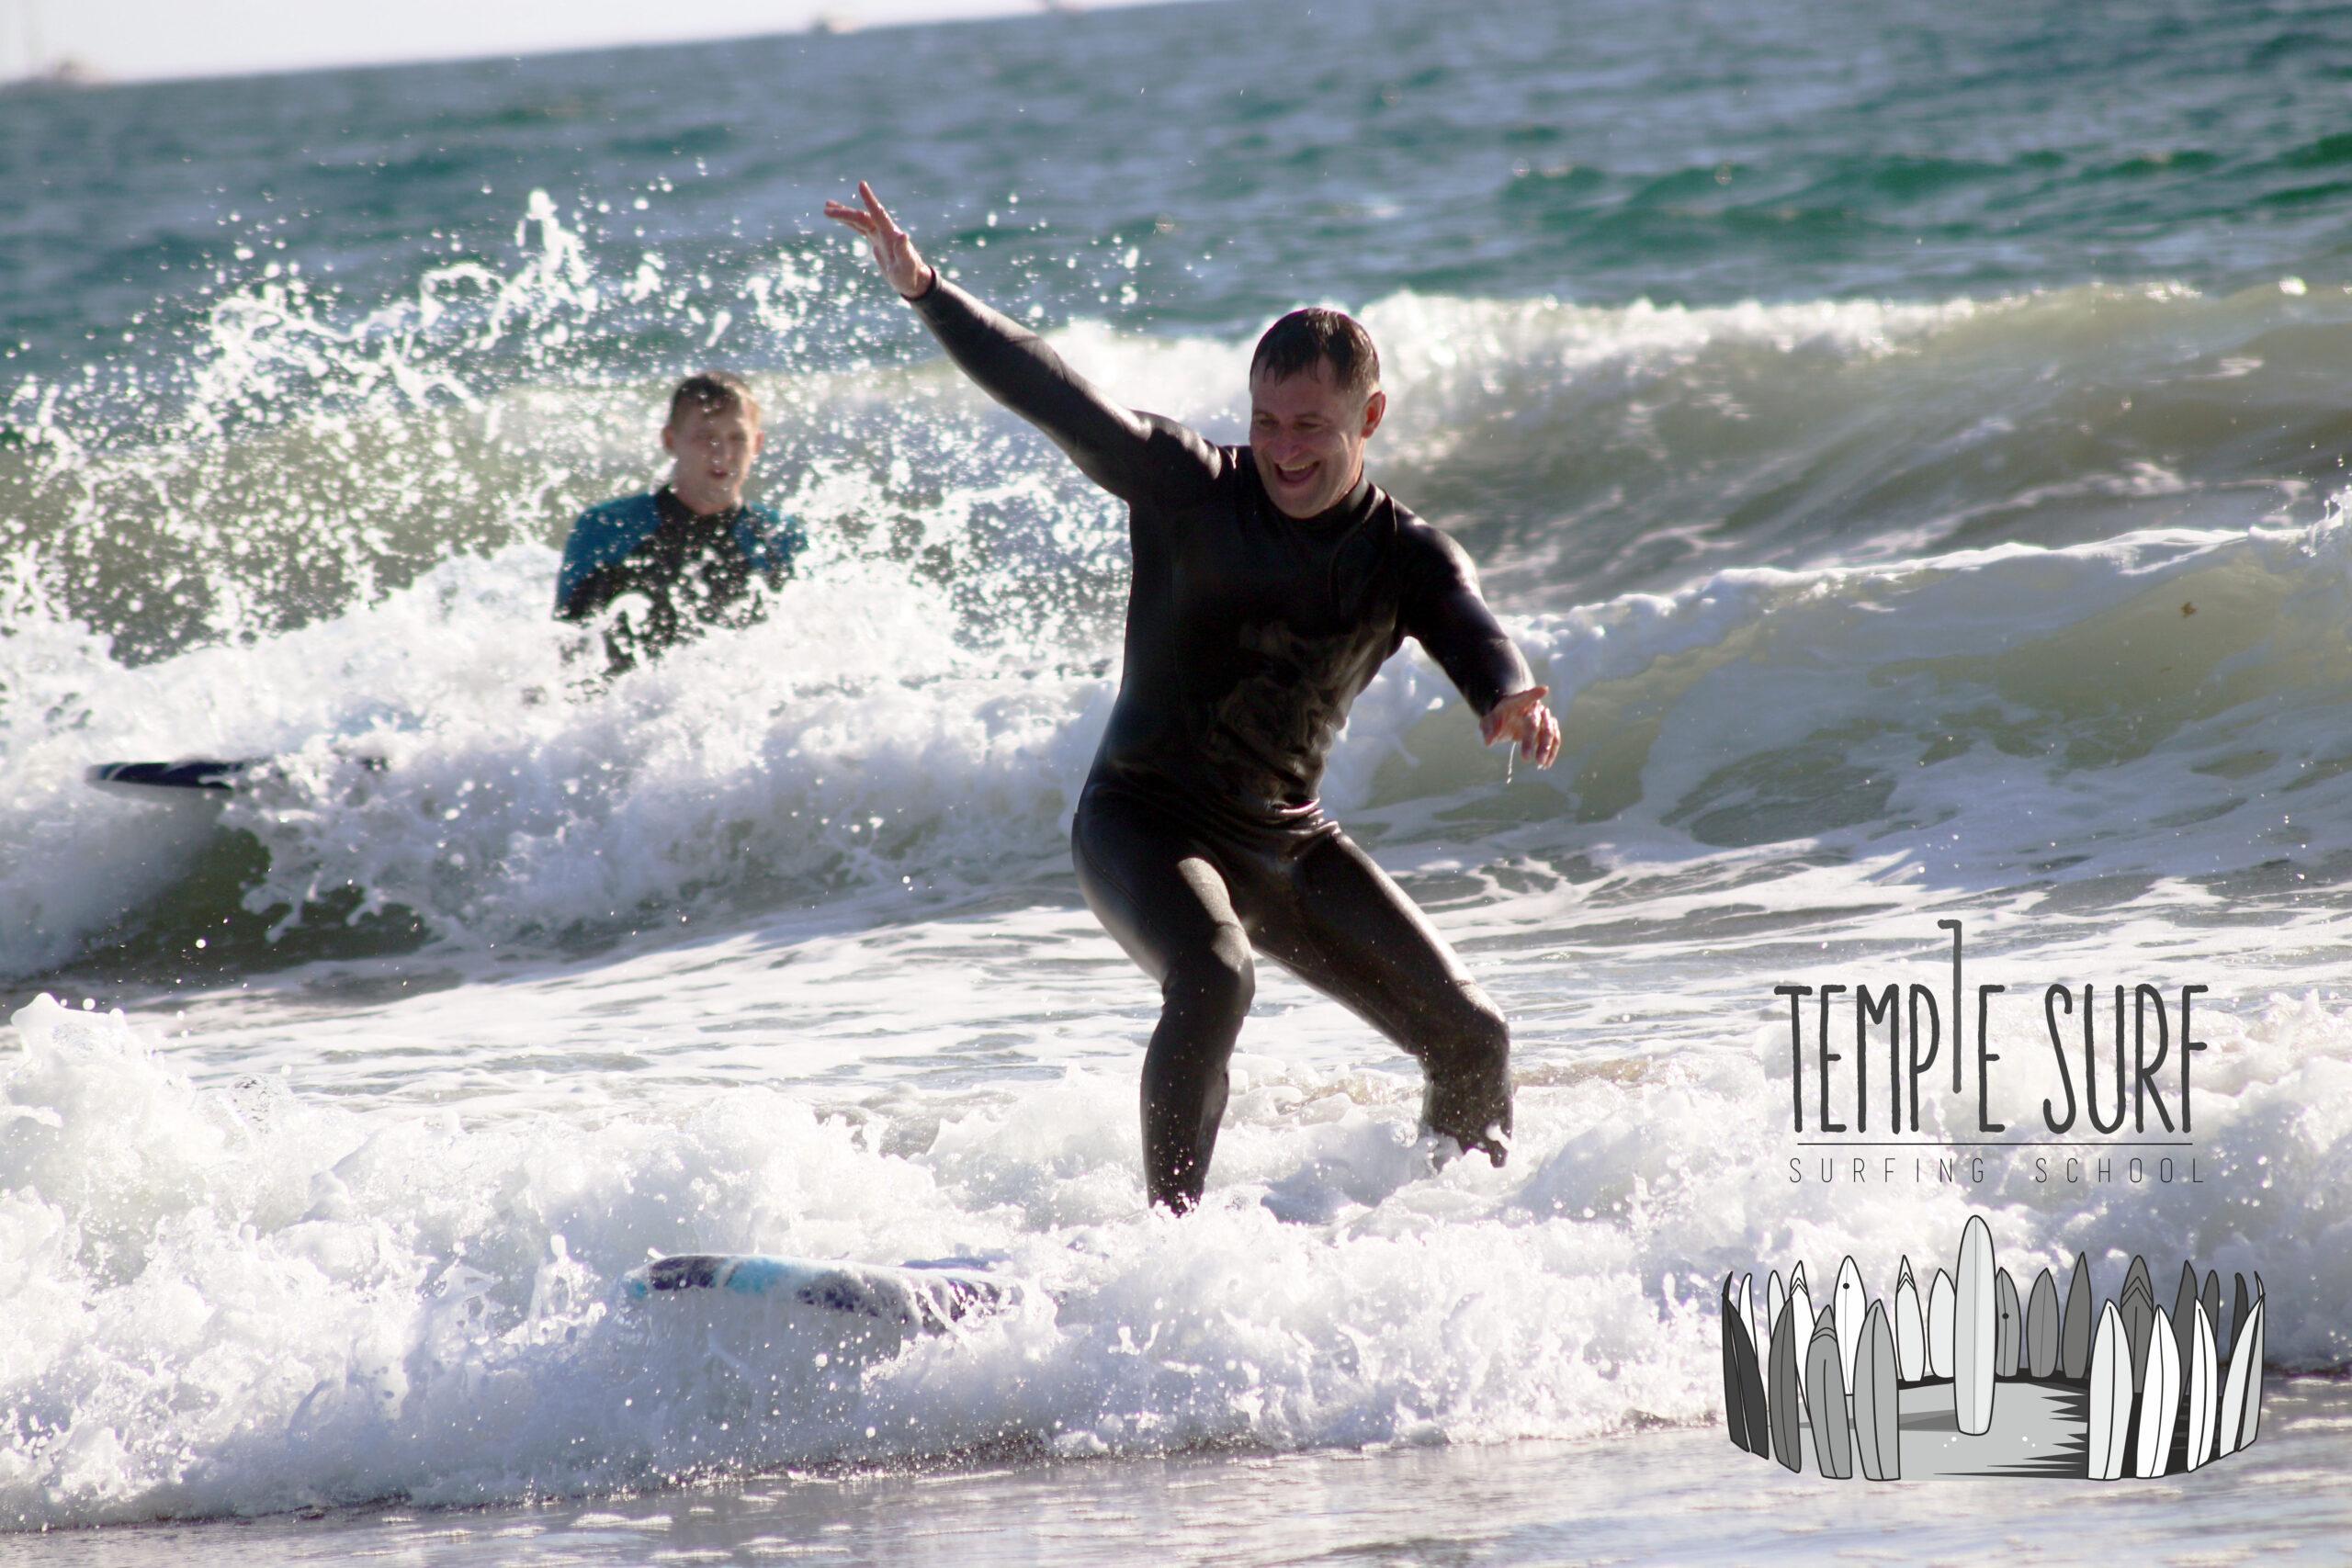 Школа серфинга Лос-Анджелес